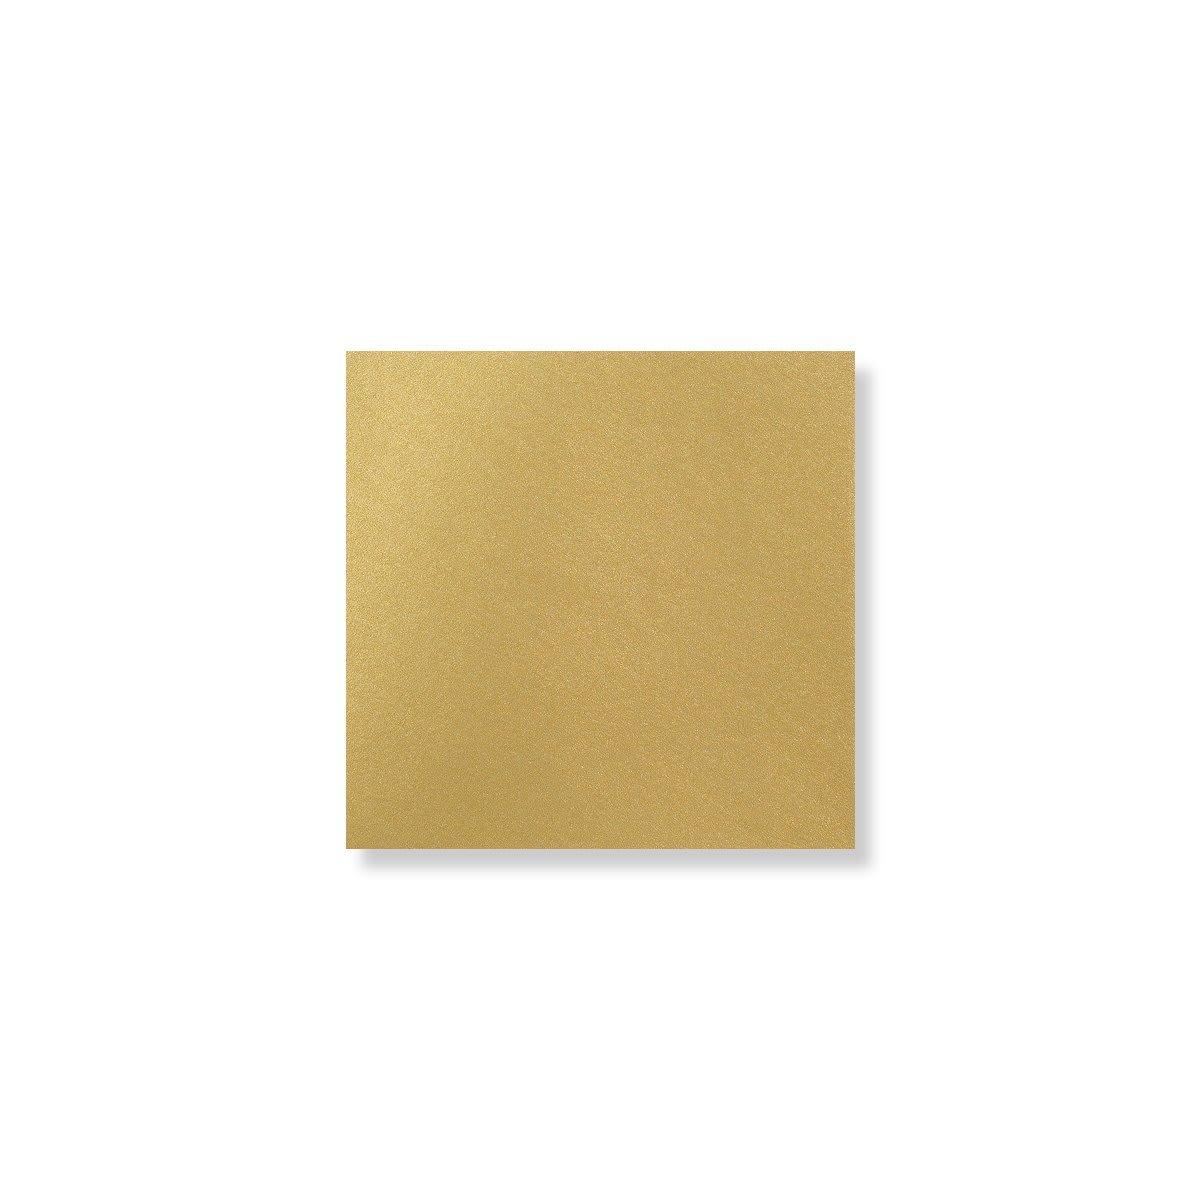 100 x 100MM GOLD PEARLESCENT ENVELOPES